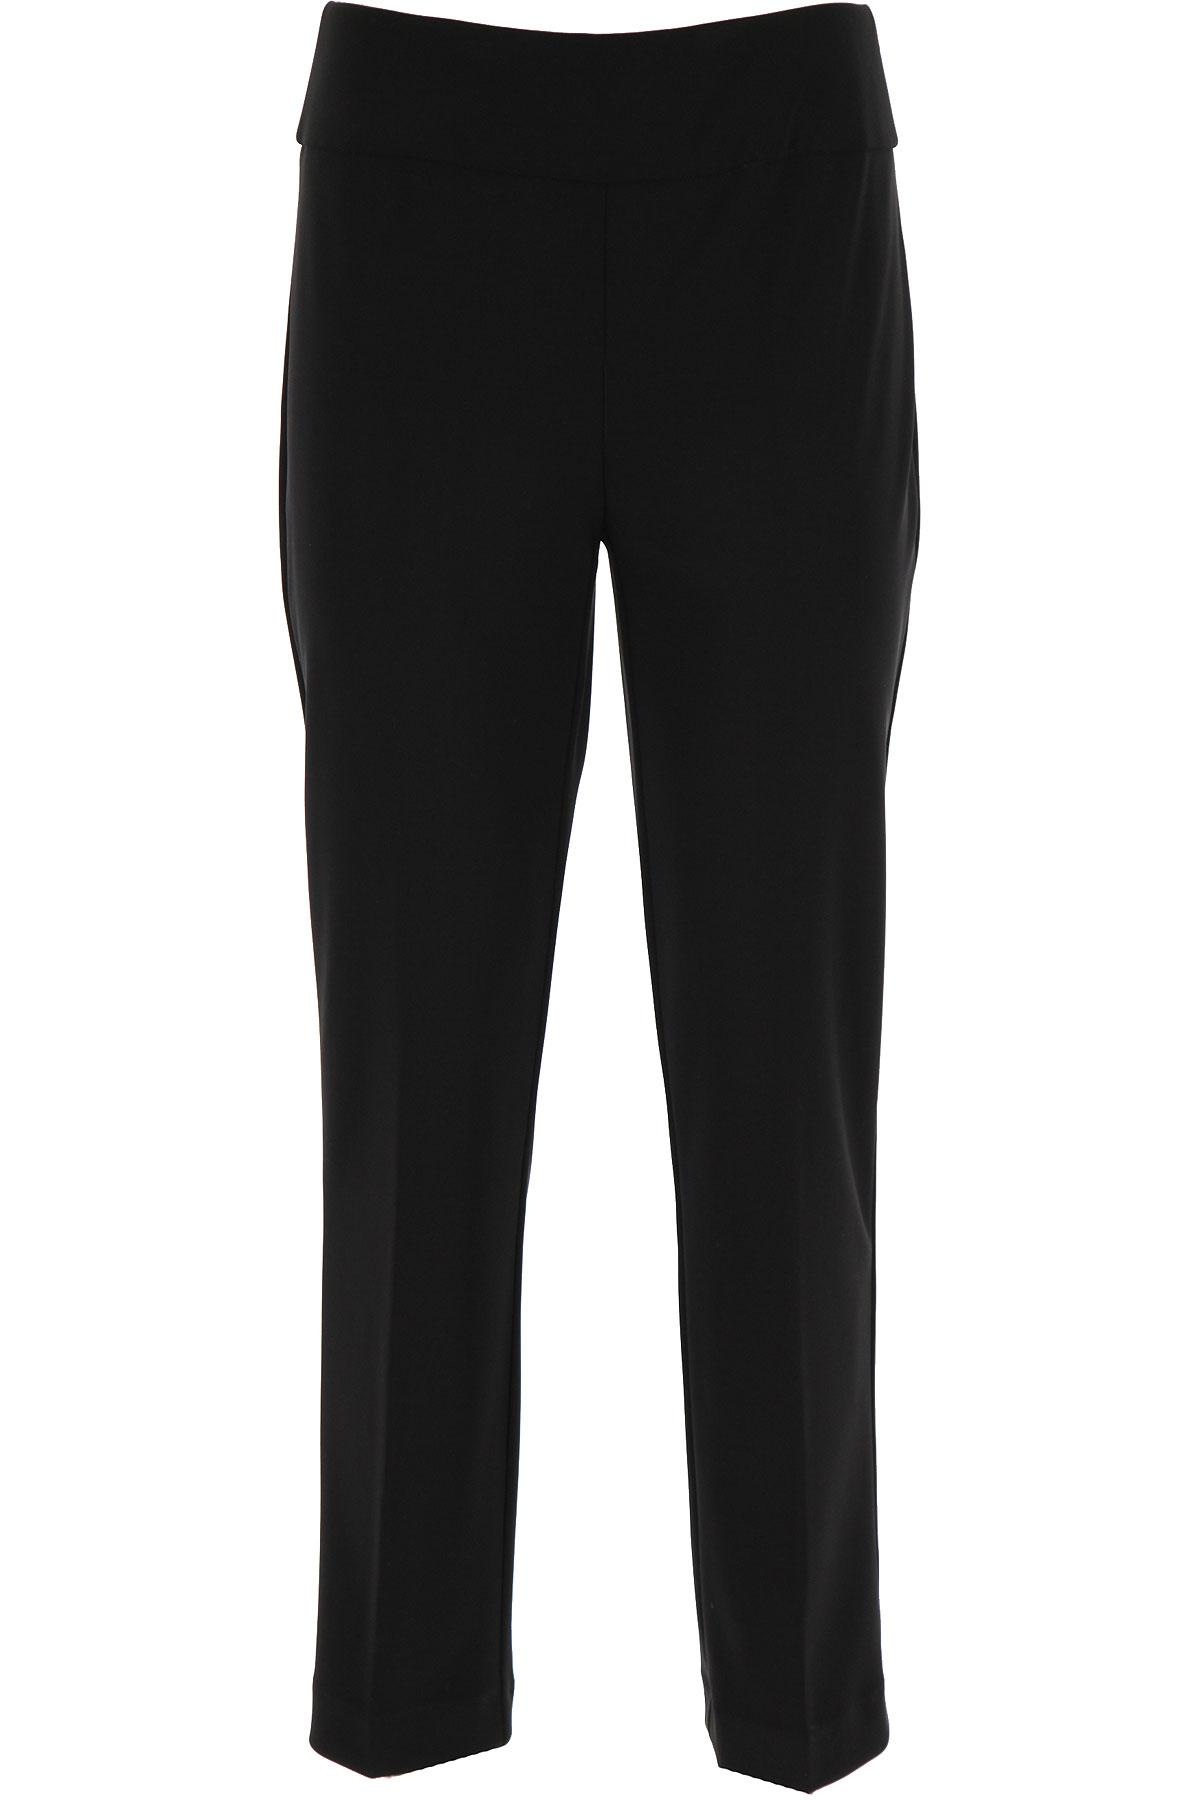 Joseph Ribkoff Pants for Women On Sale, Black, polyester, 2019, 28 30 32